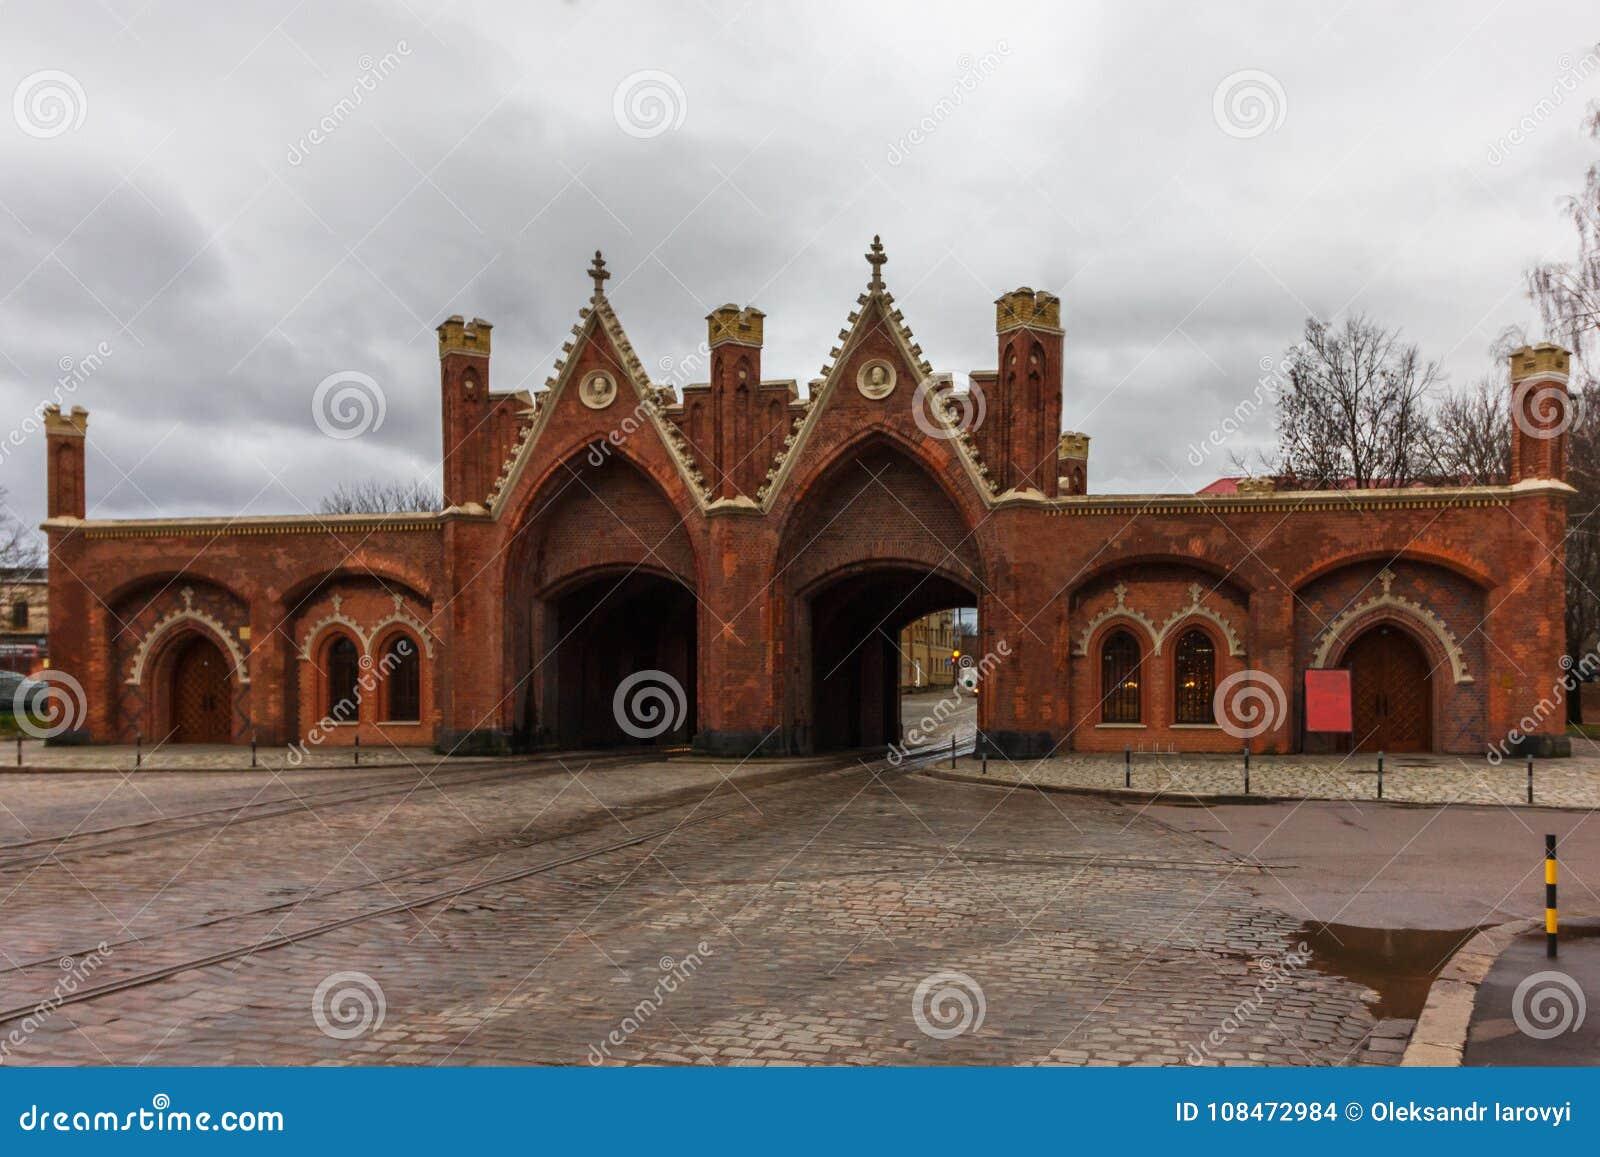 Kaliningrad, Fédération de Russie - 4 janvier 2018 : La Porte de Brandebourg